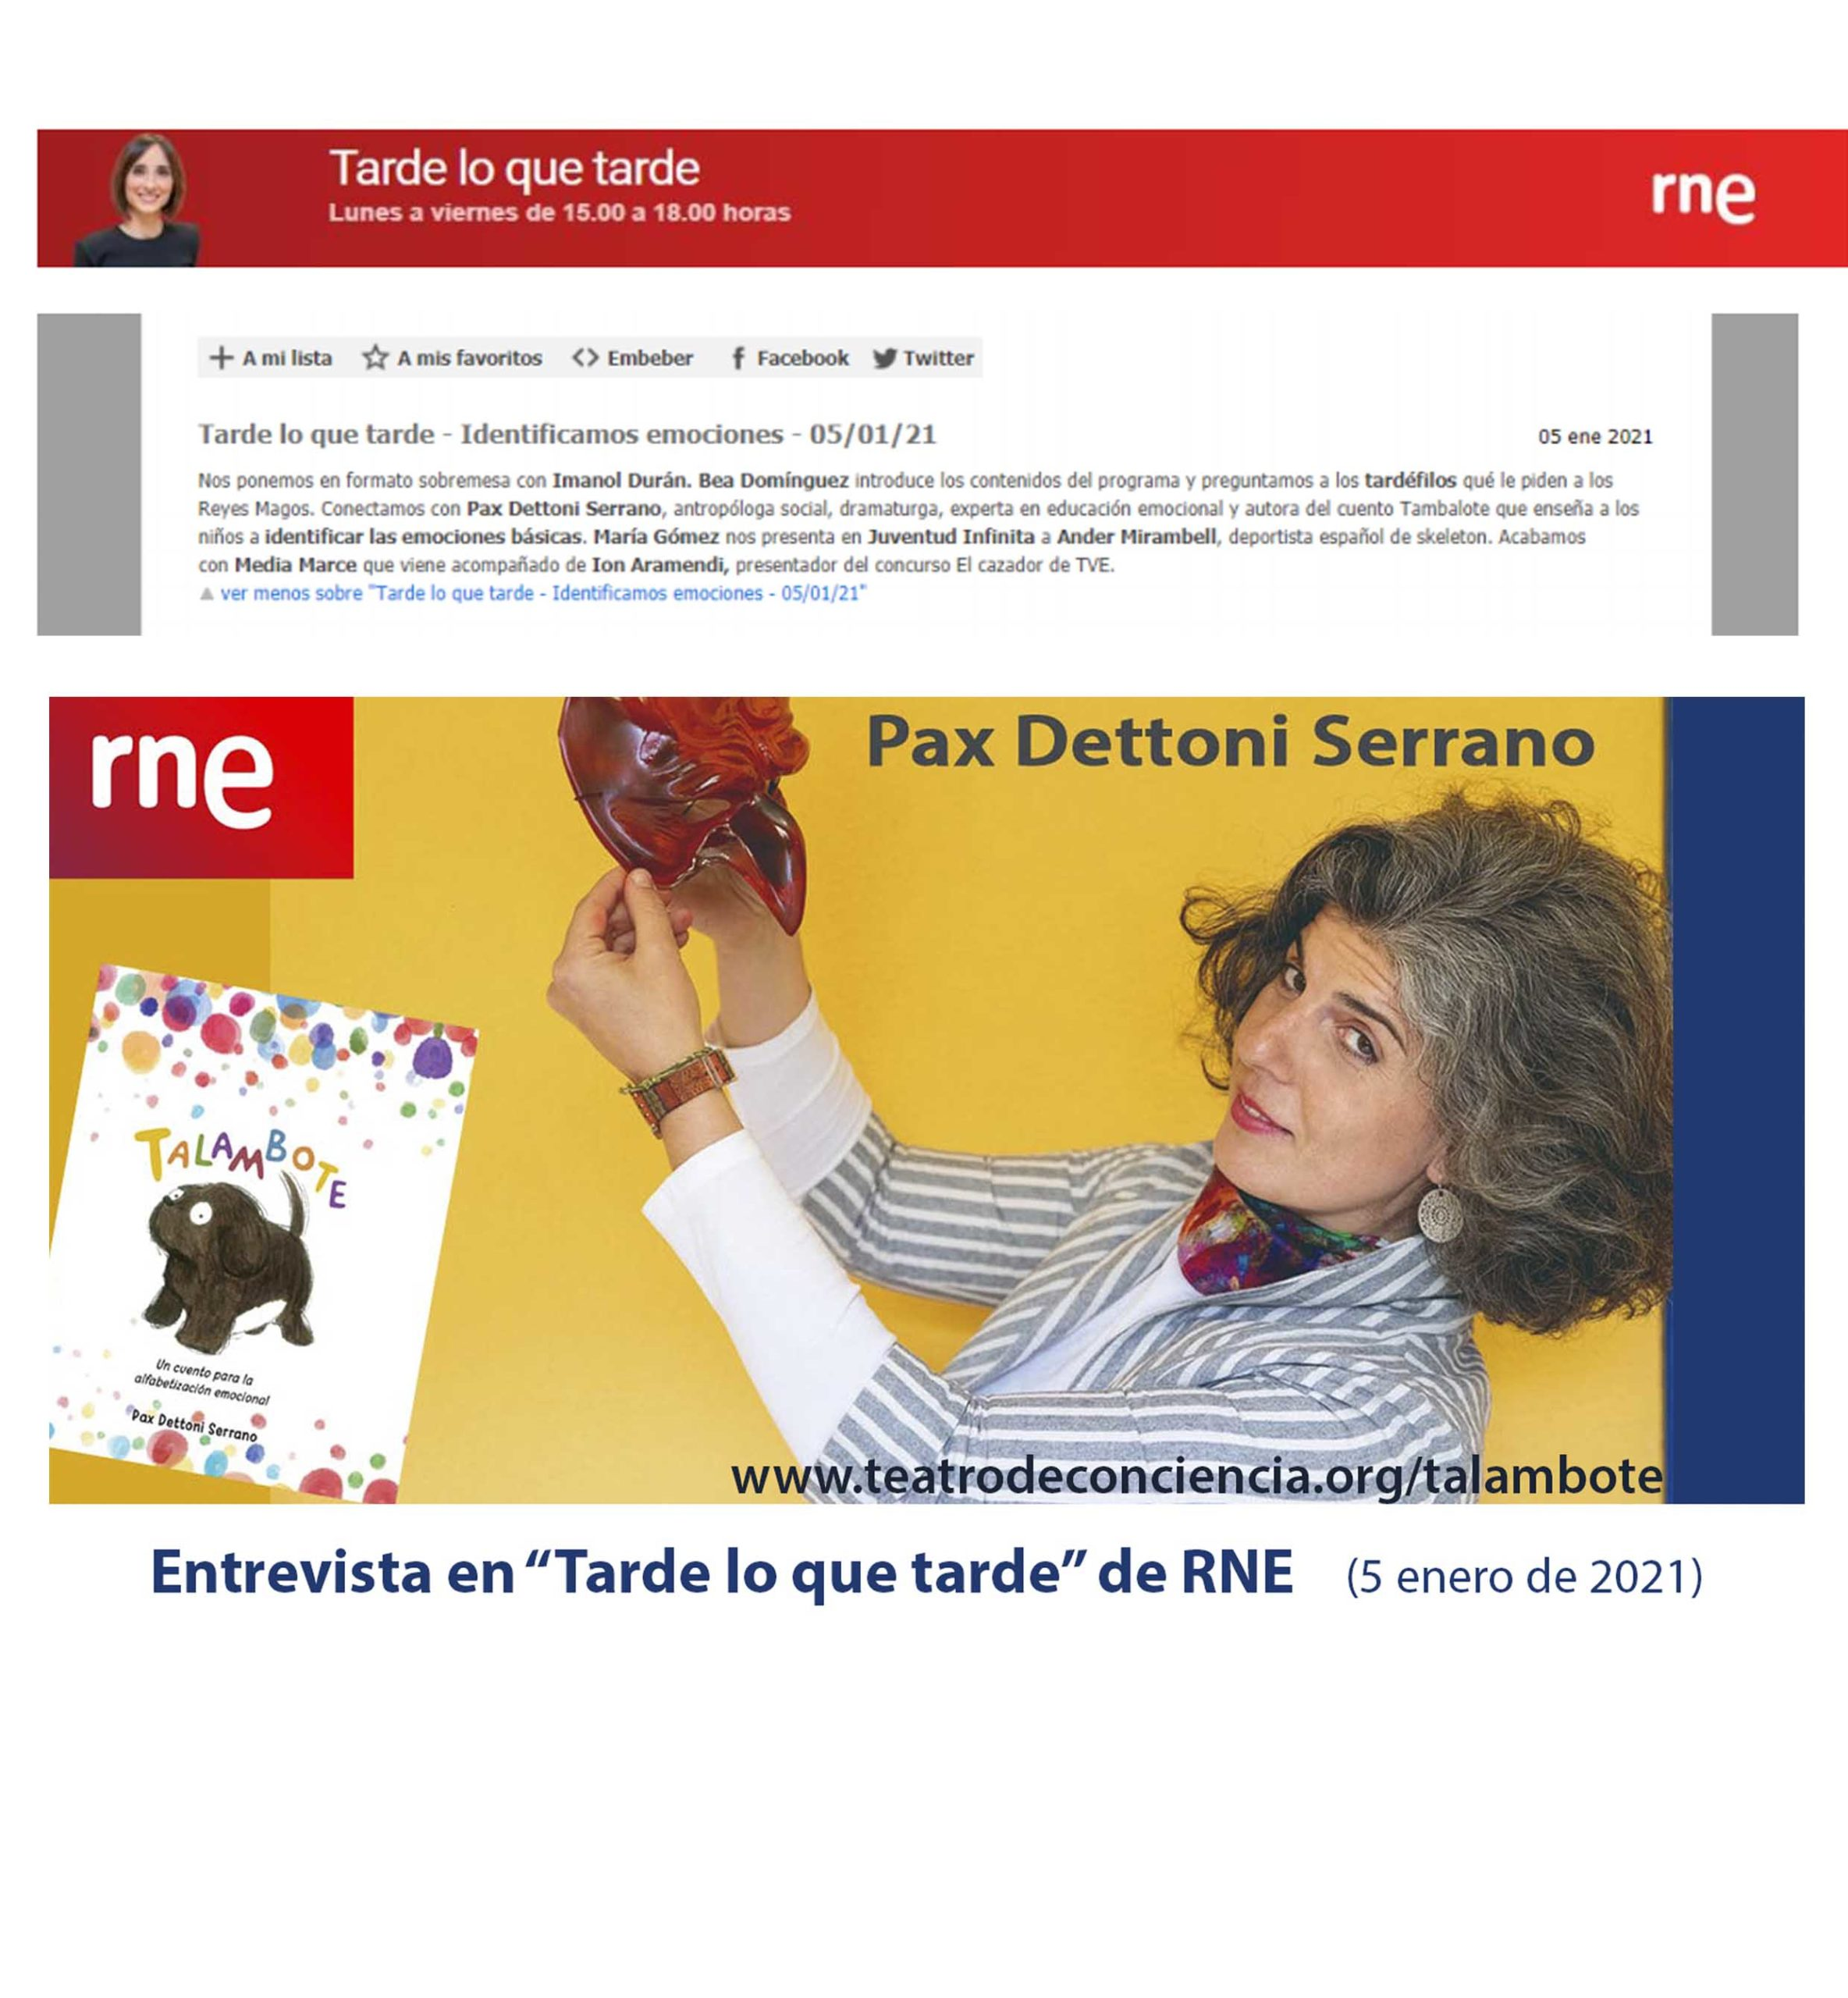 Carrusel 2 Talambote.RNE. Pax-Dettoni